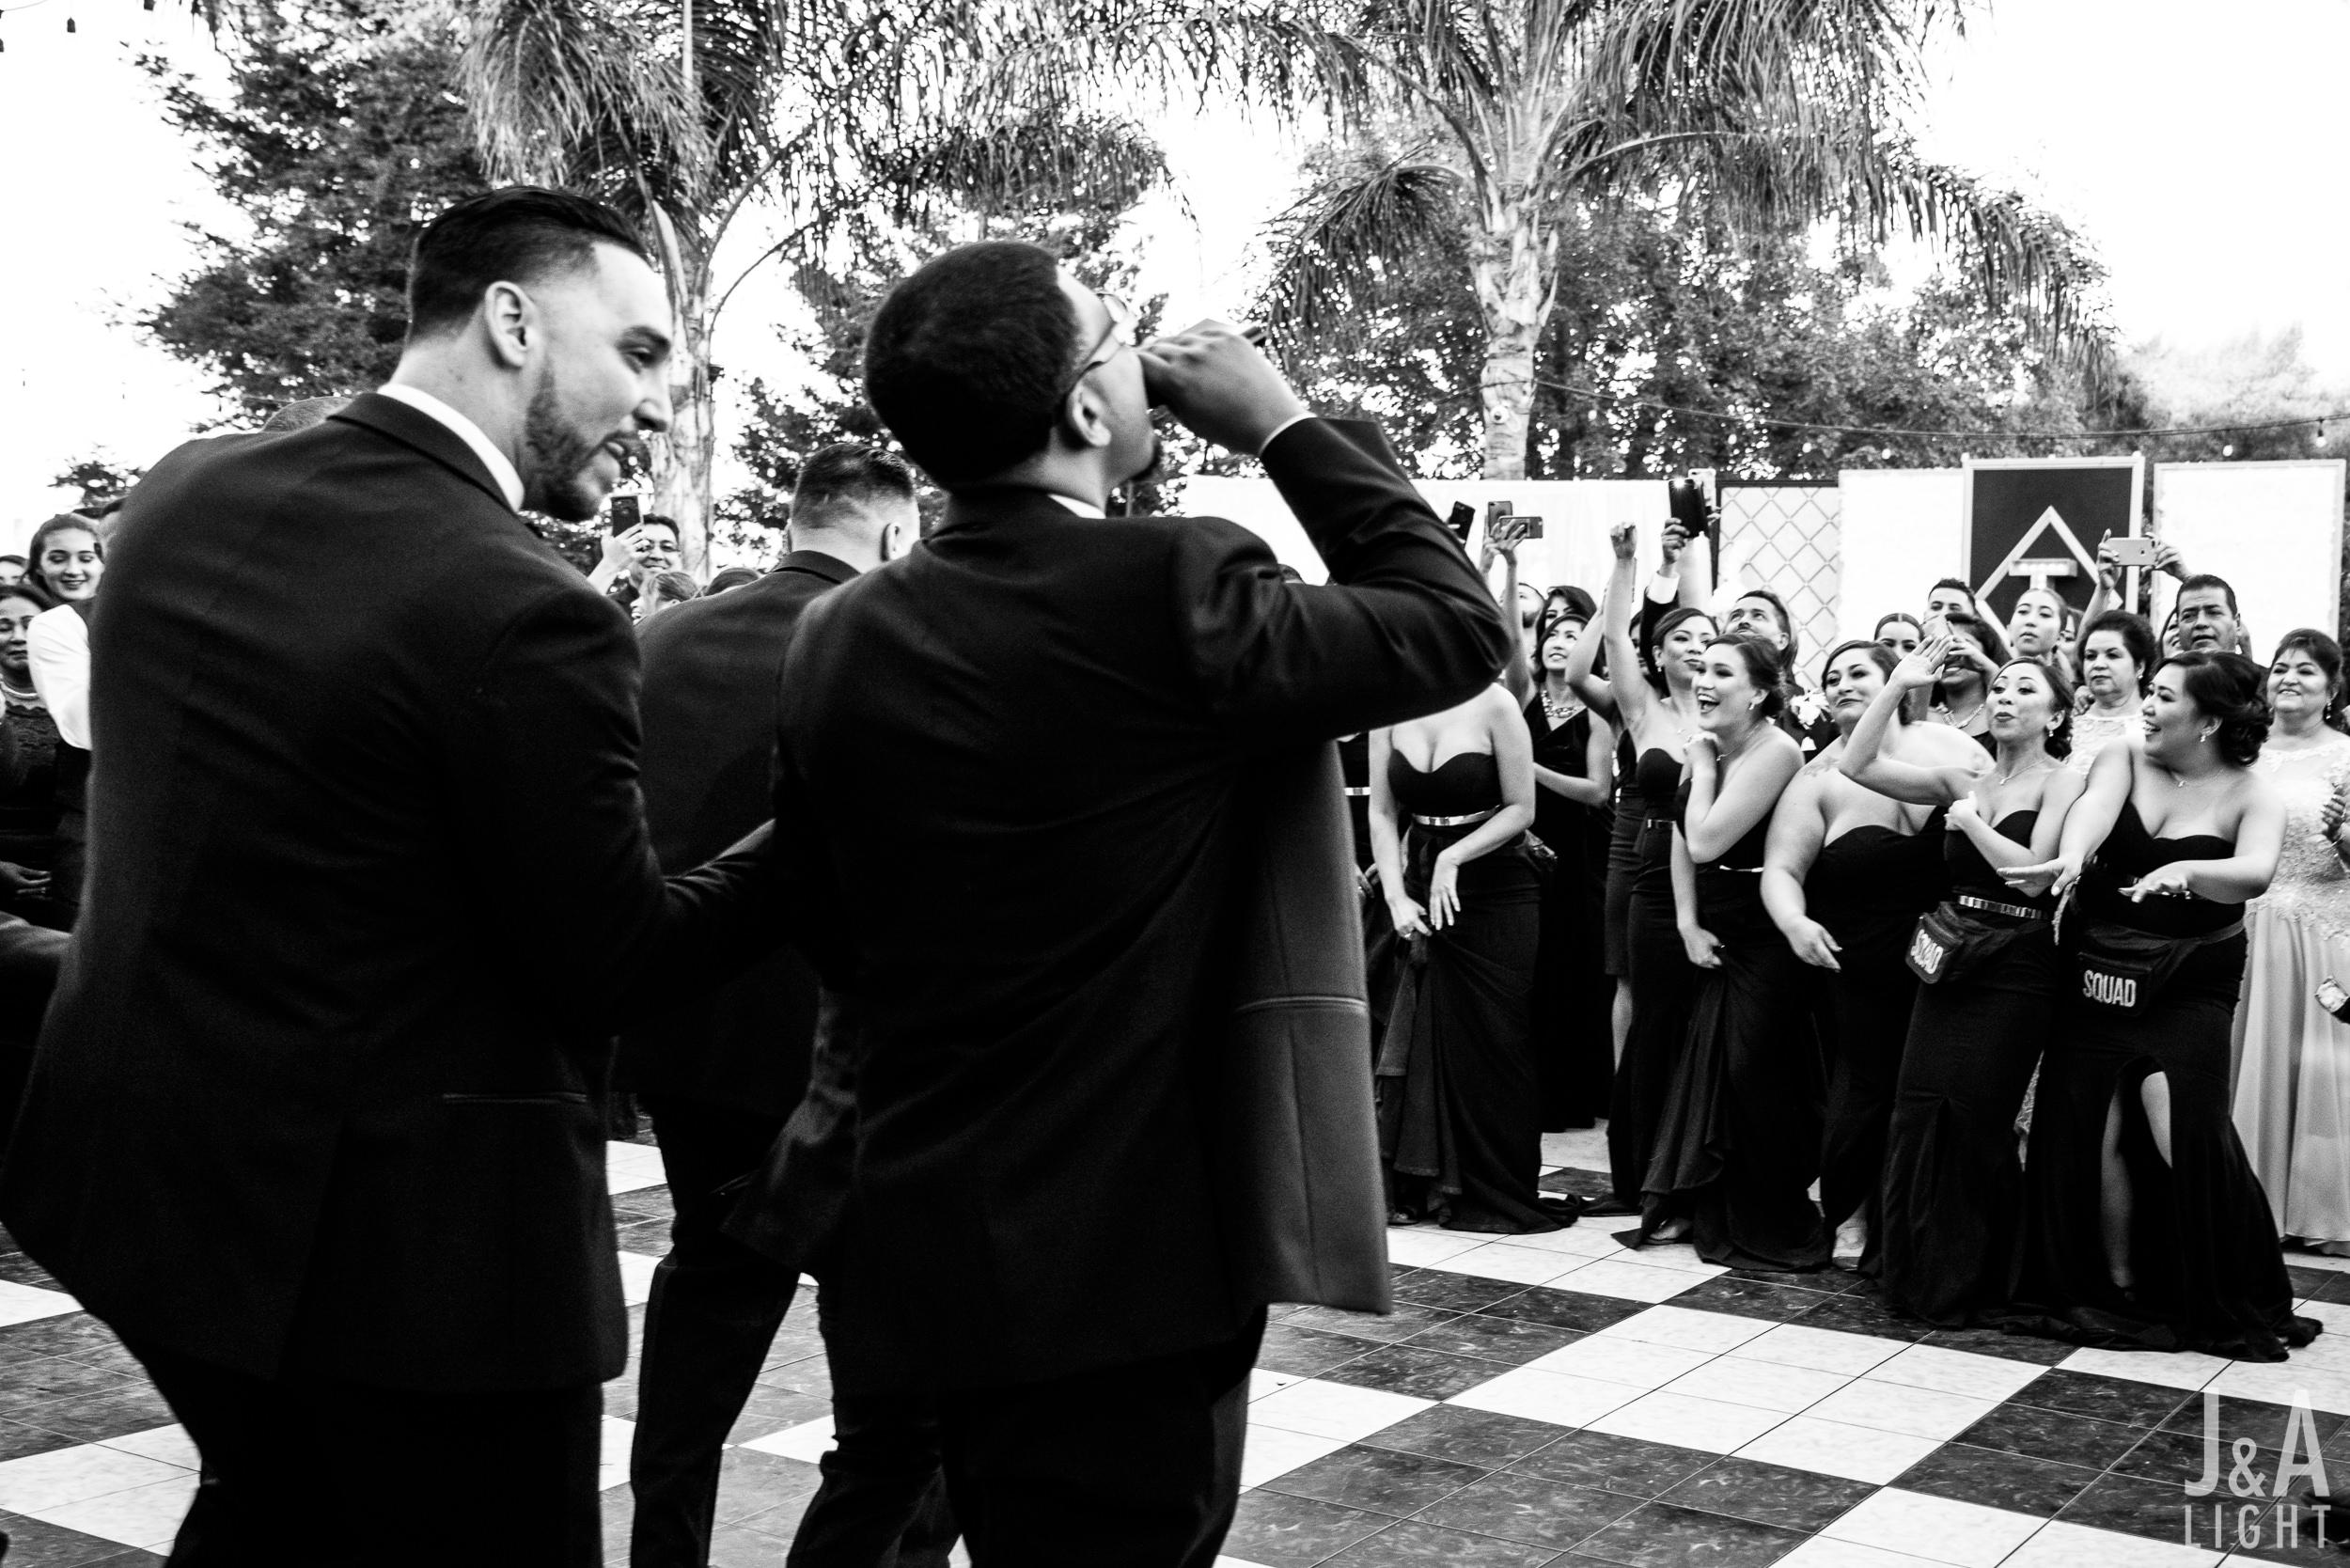 20171014-JanDan-LosBanos-GlassMansion-Wedding-Blog-056.jpg